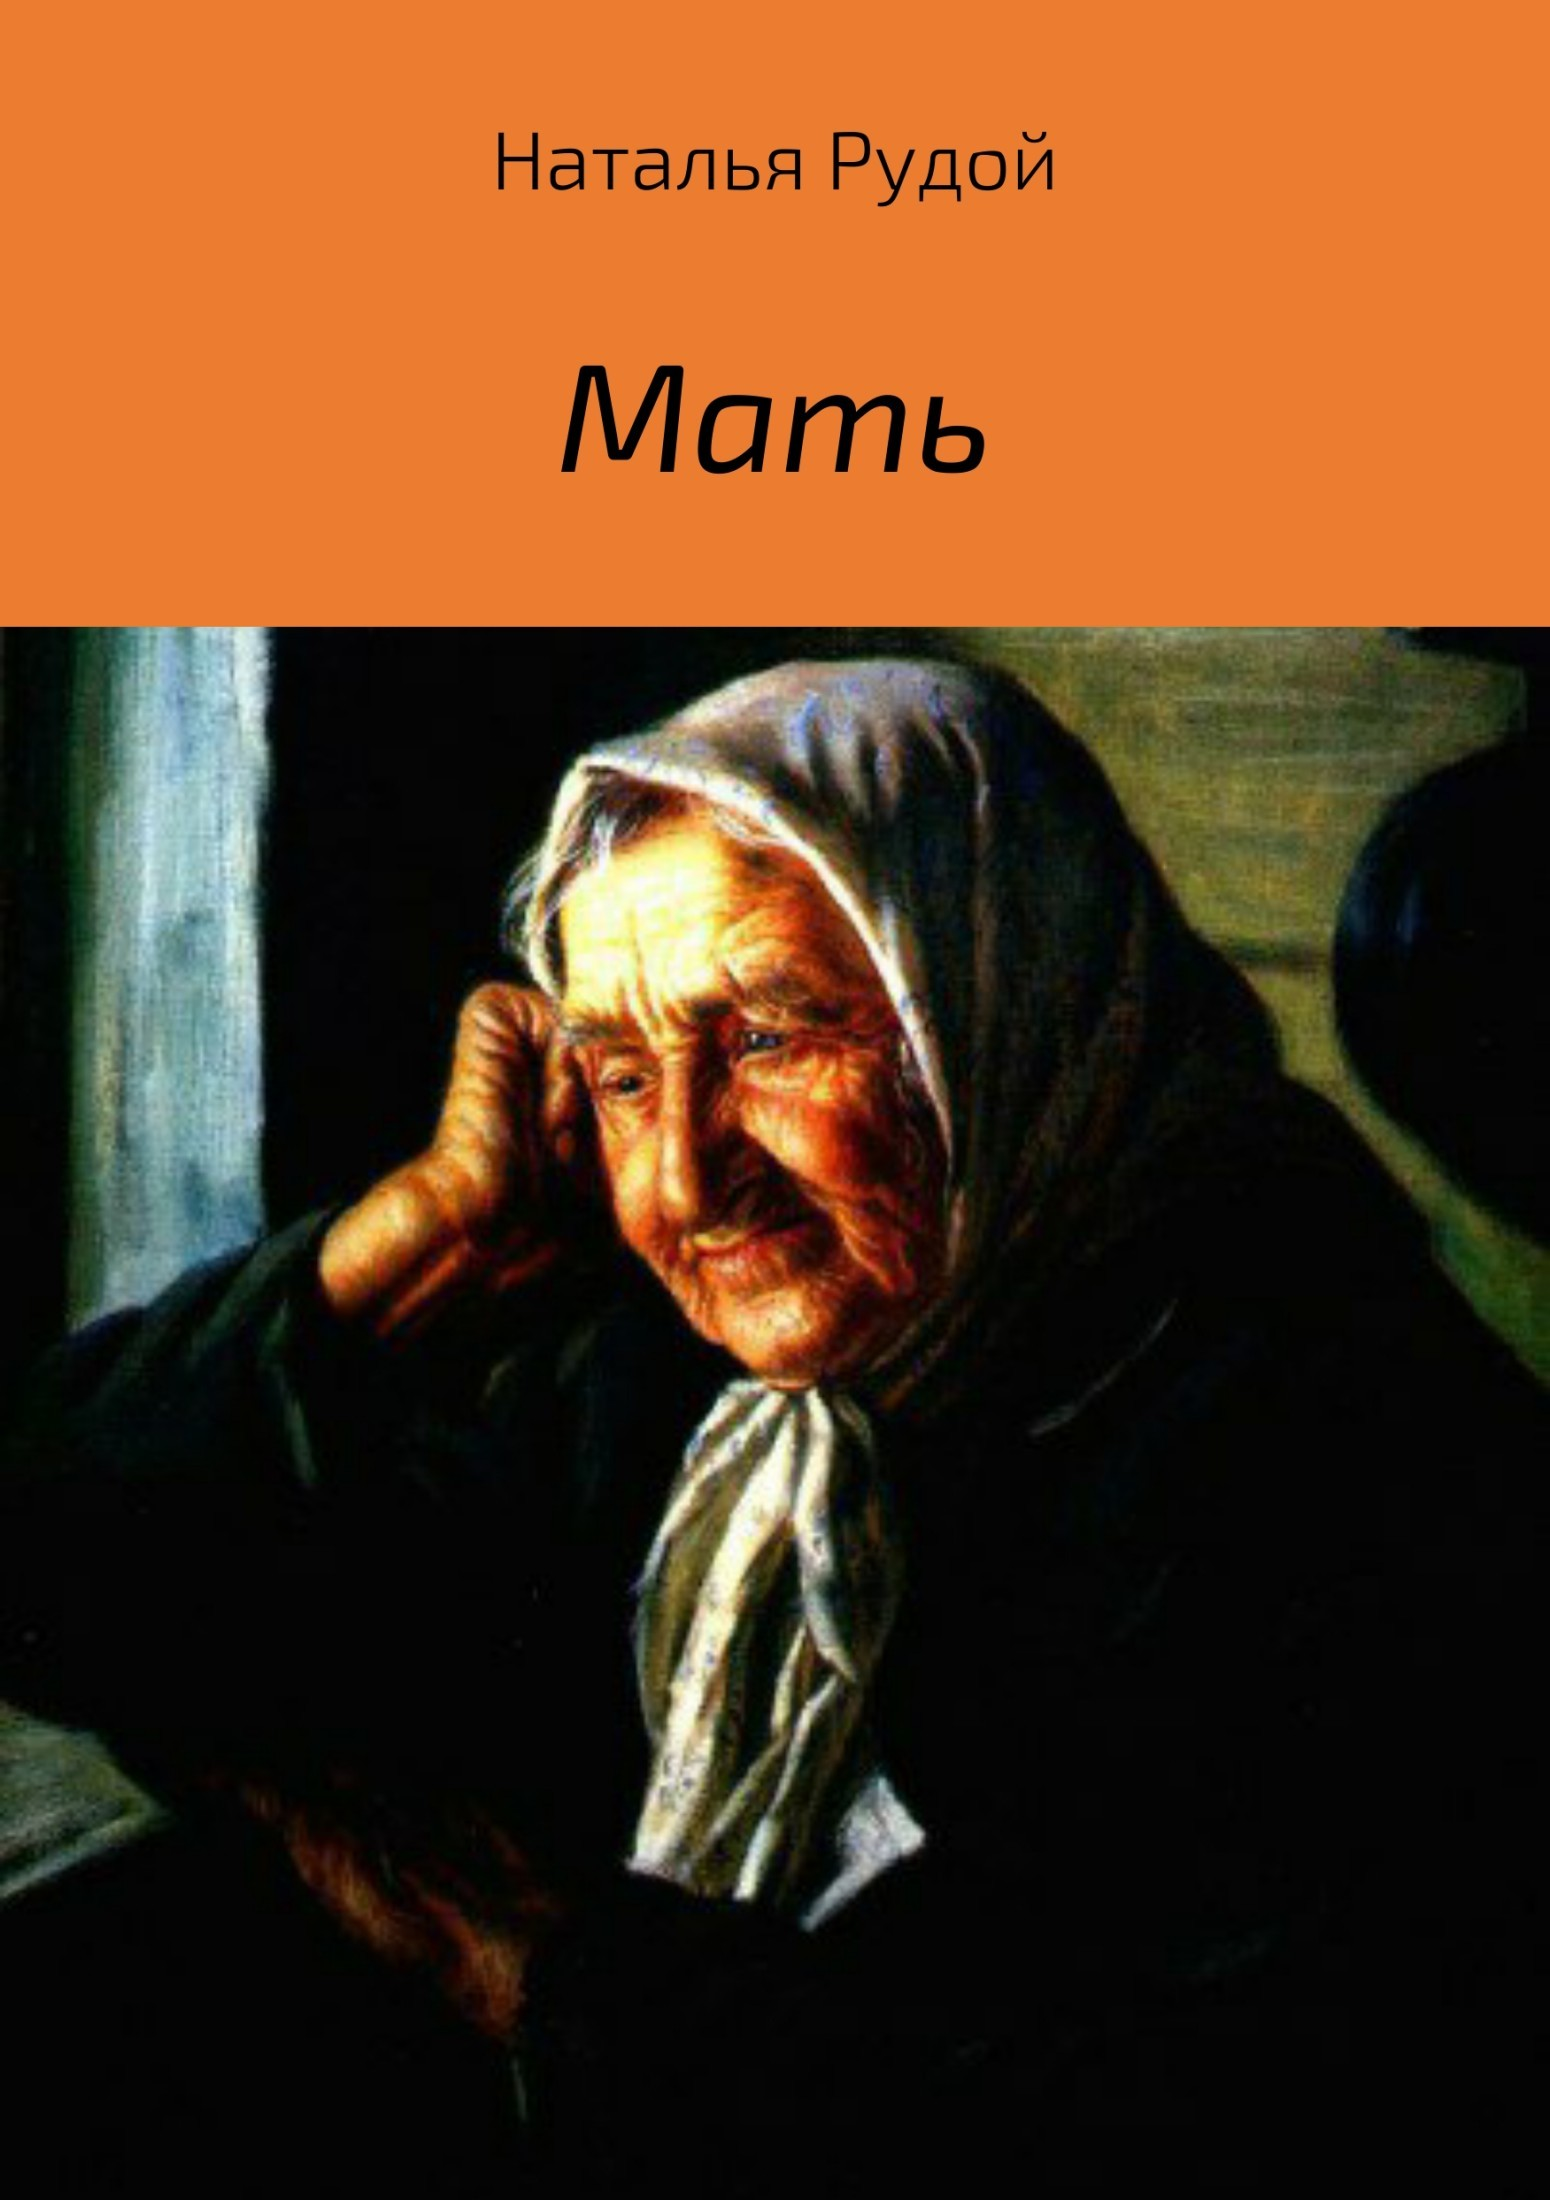 Наталья Рудой Мать наталья рудой мать